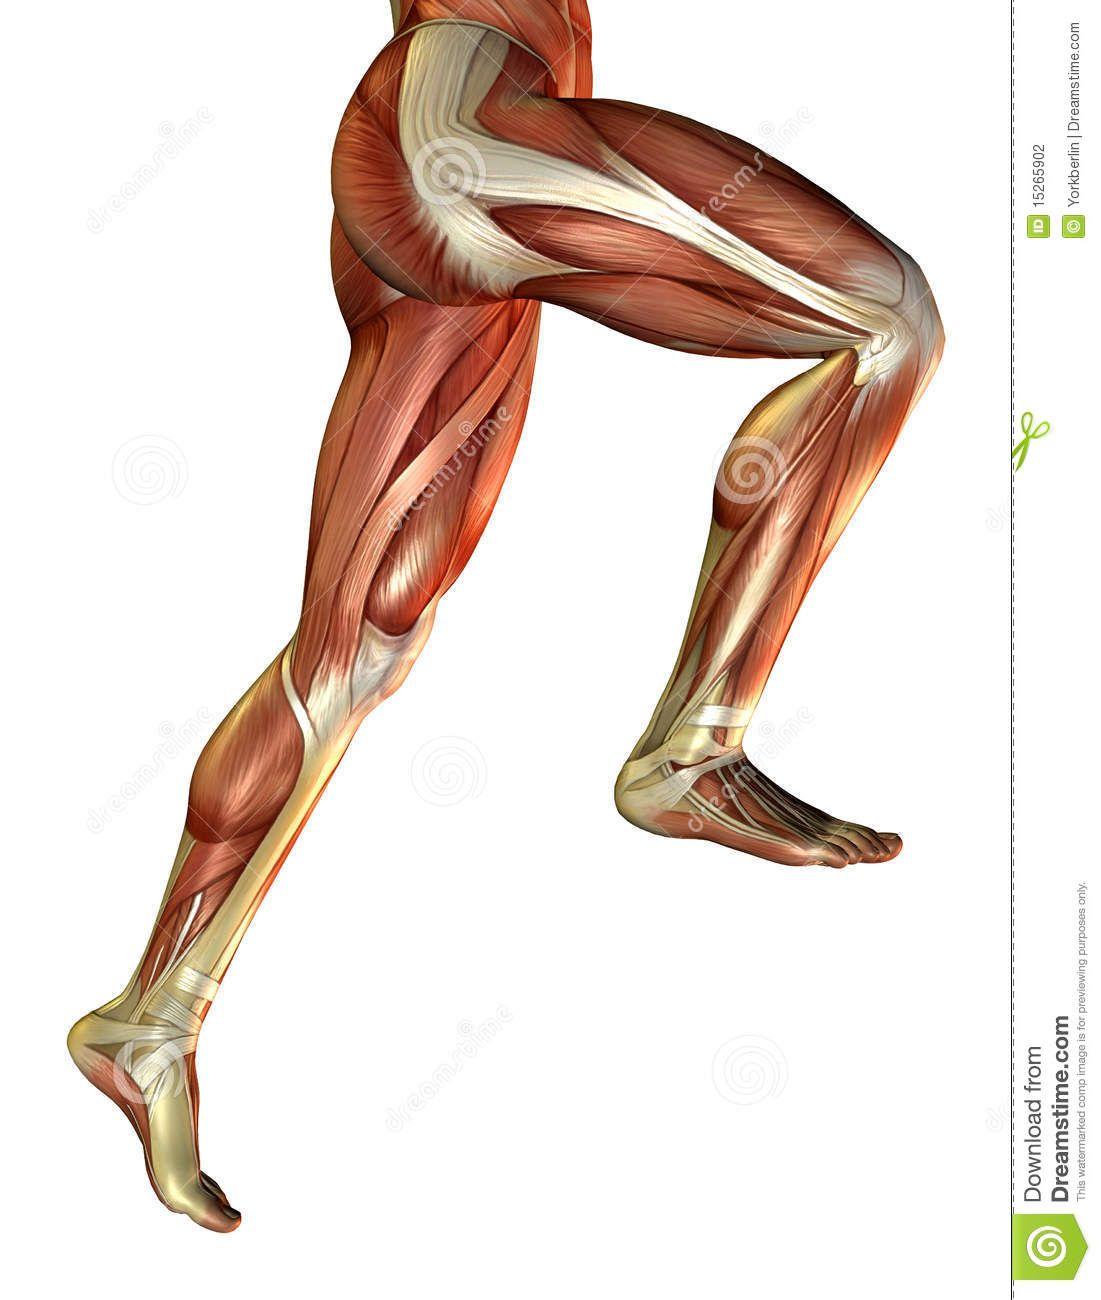 Leg Muscles Man 15265902 Jpg 1 101 1 300 Pixels Anatomia